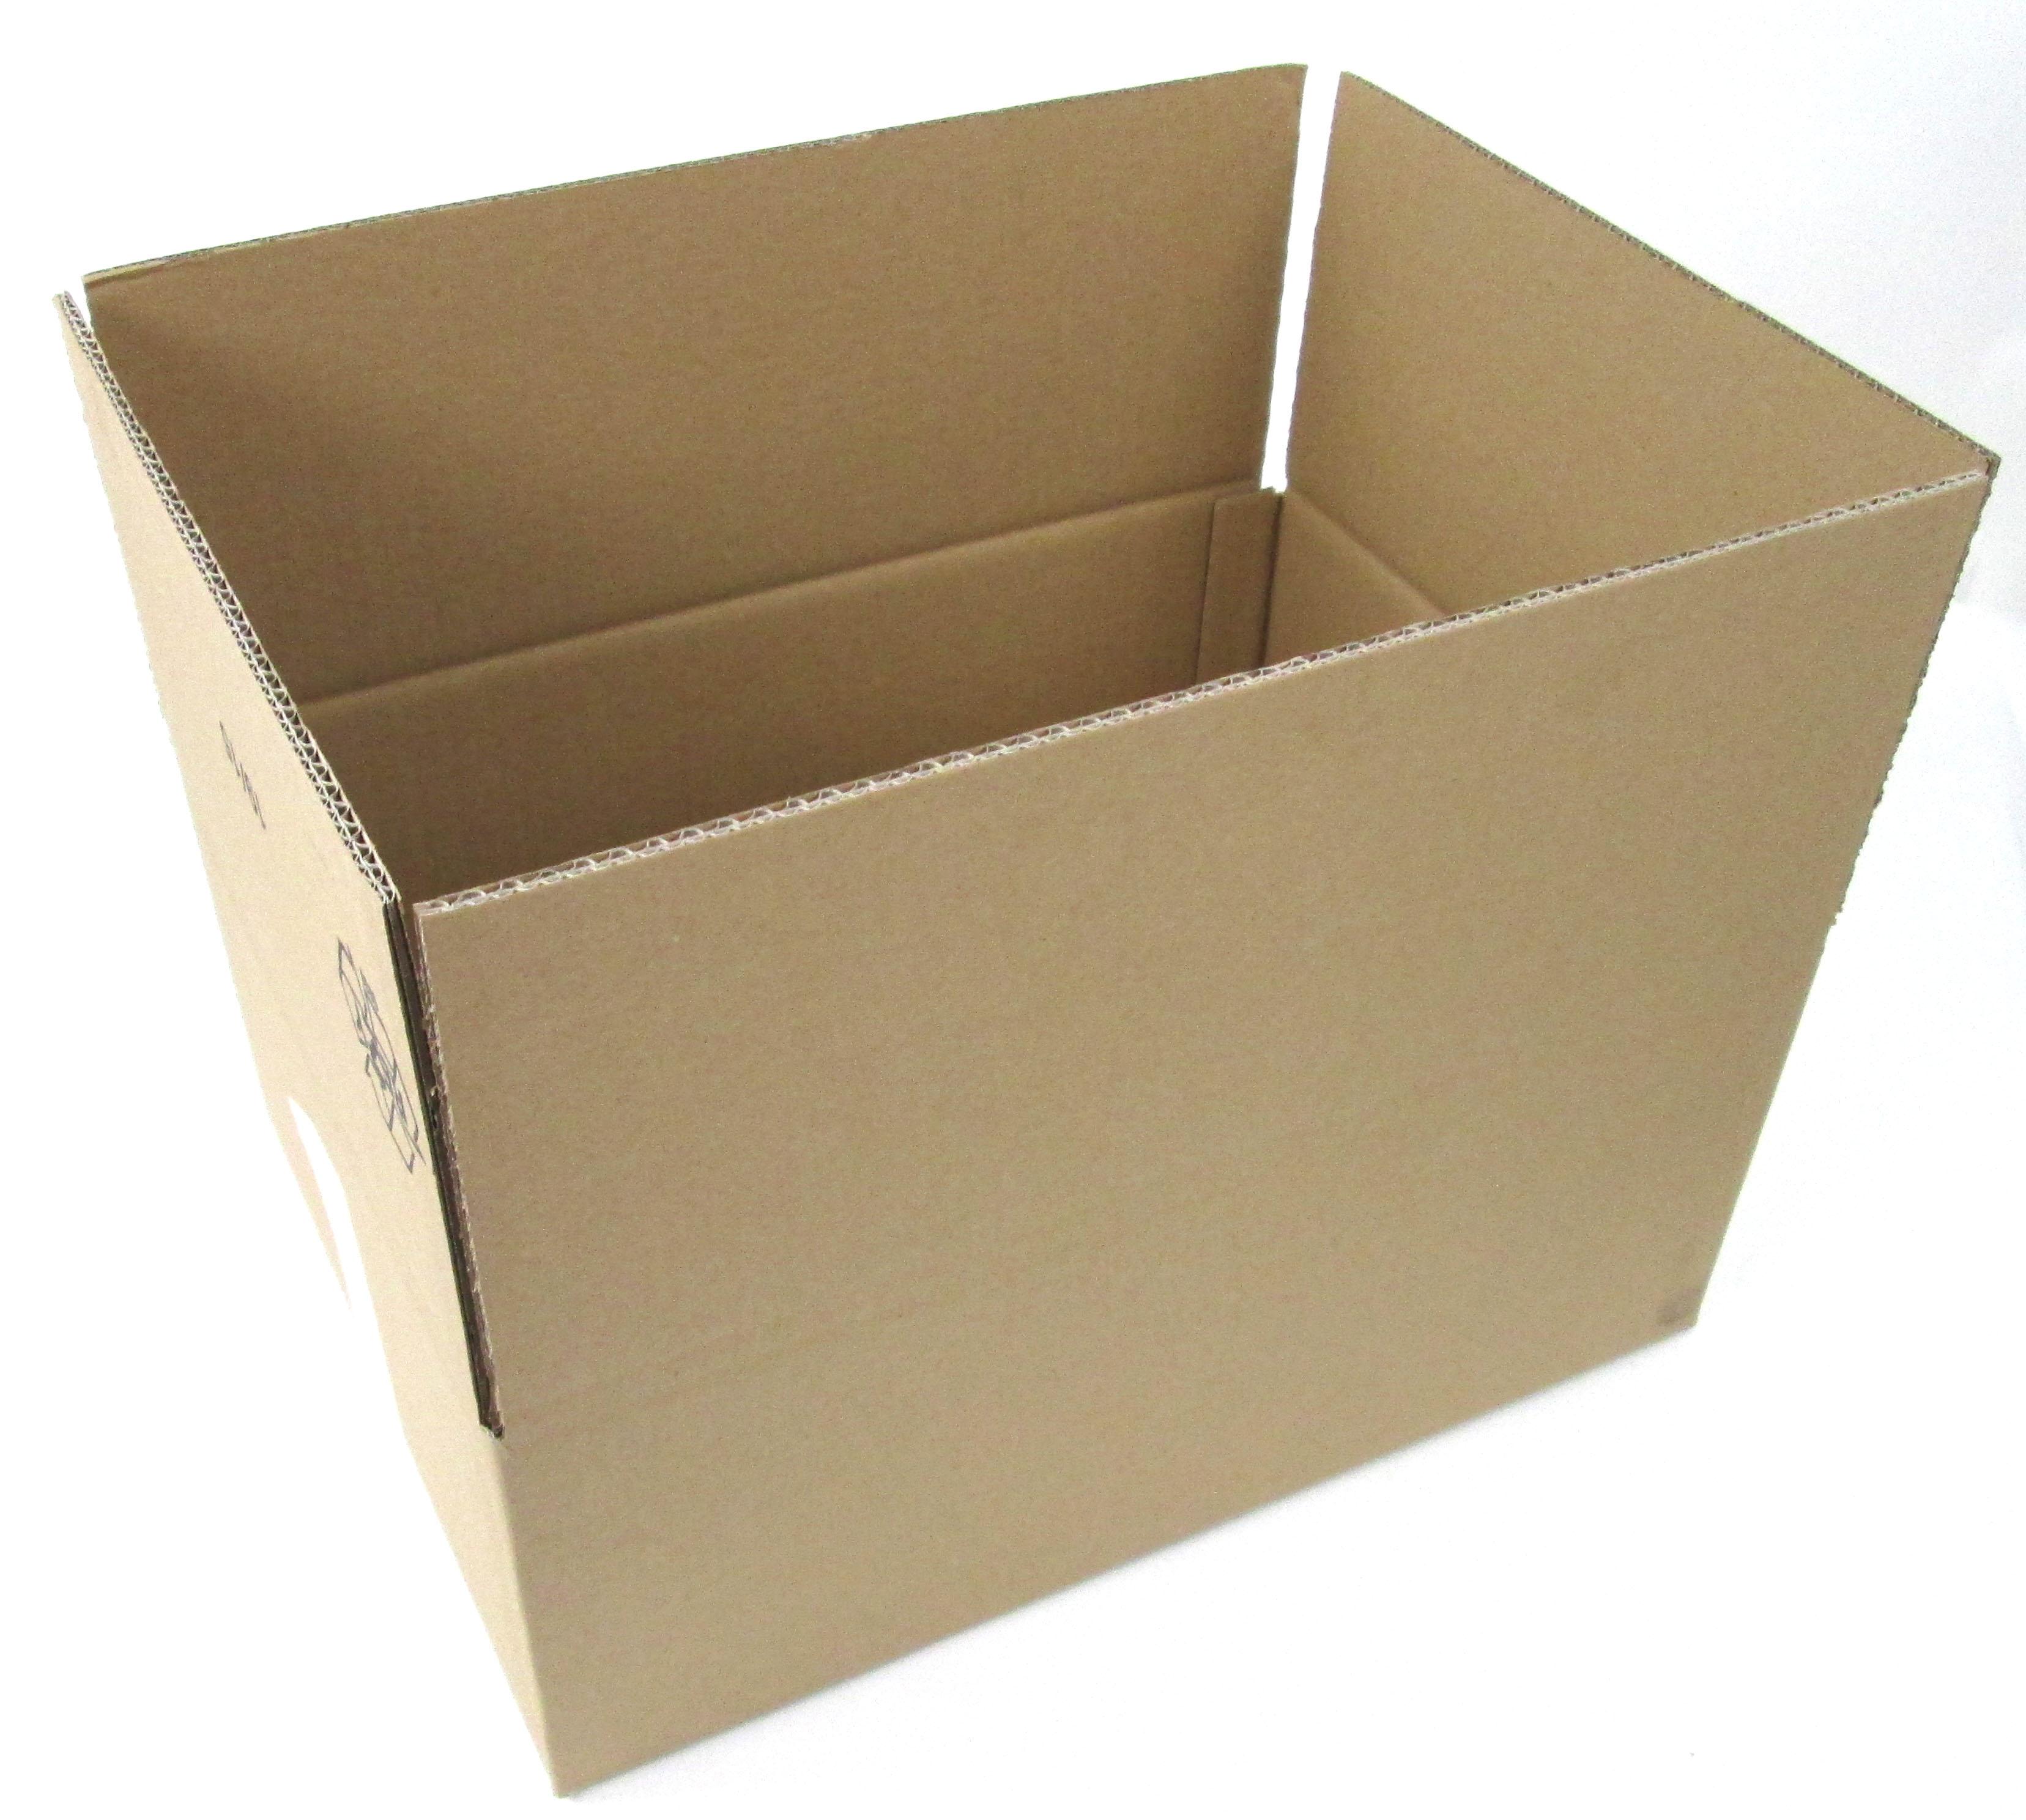 kartonagen schmidt 400 x 300 x 150 mm wellpapp faltkarton bc onlineshop f r. Black Bedroom Furniture Sets. Home Design Ideas